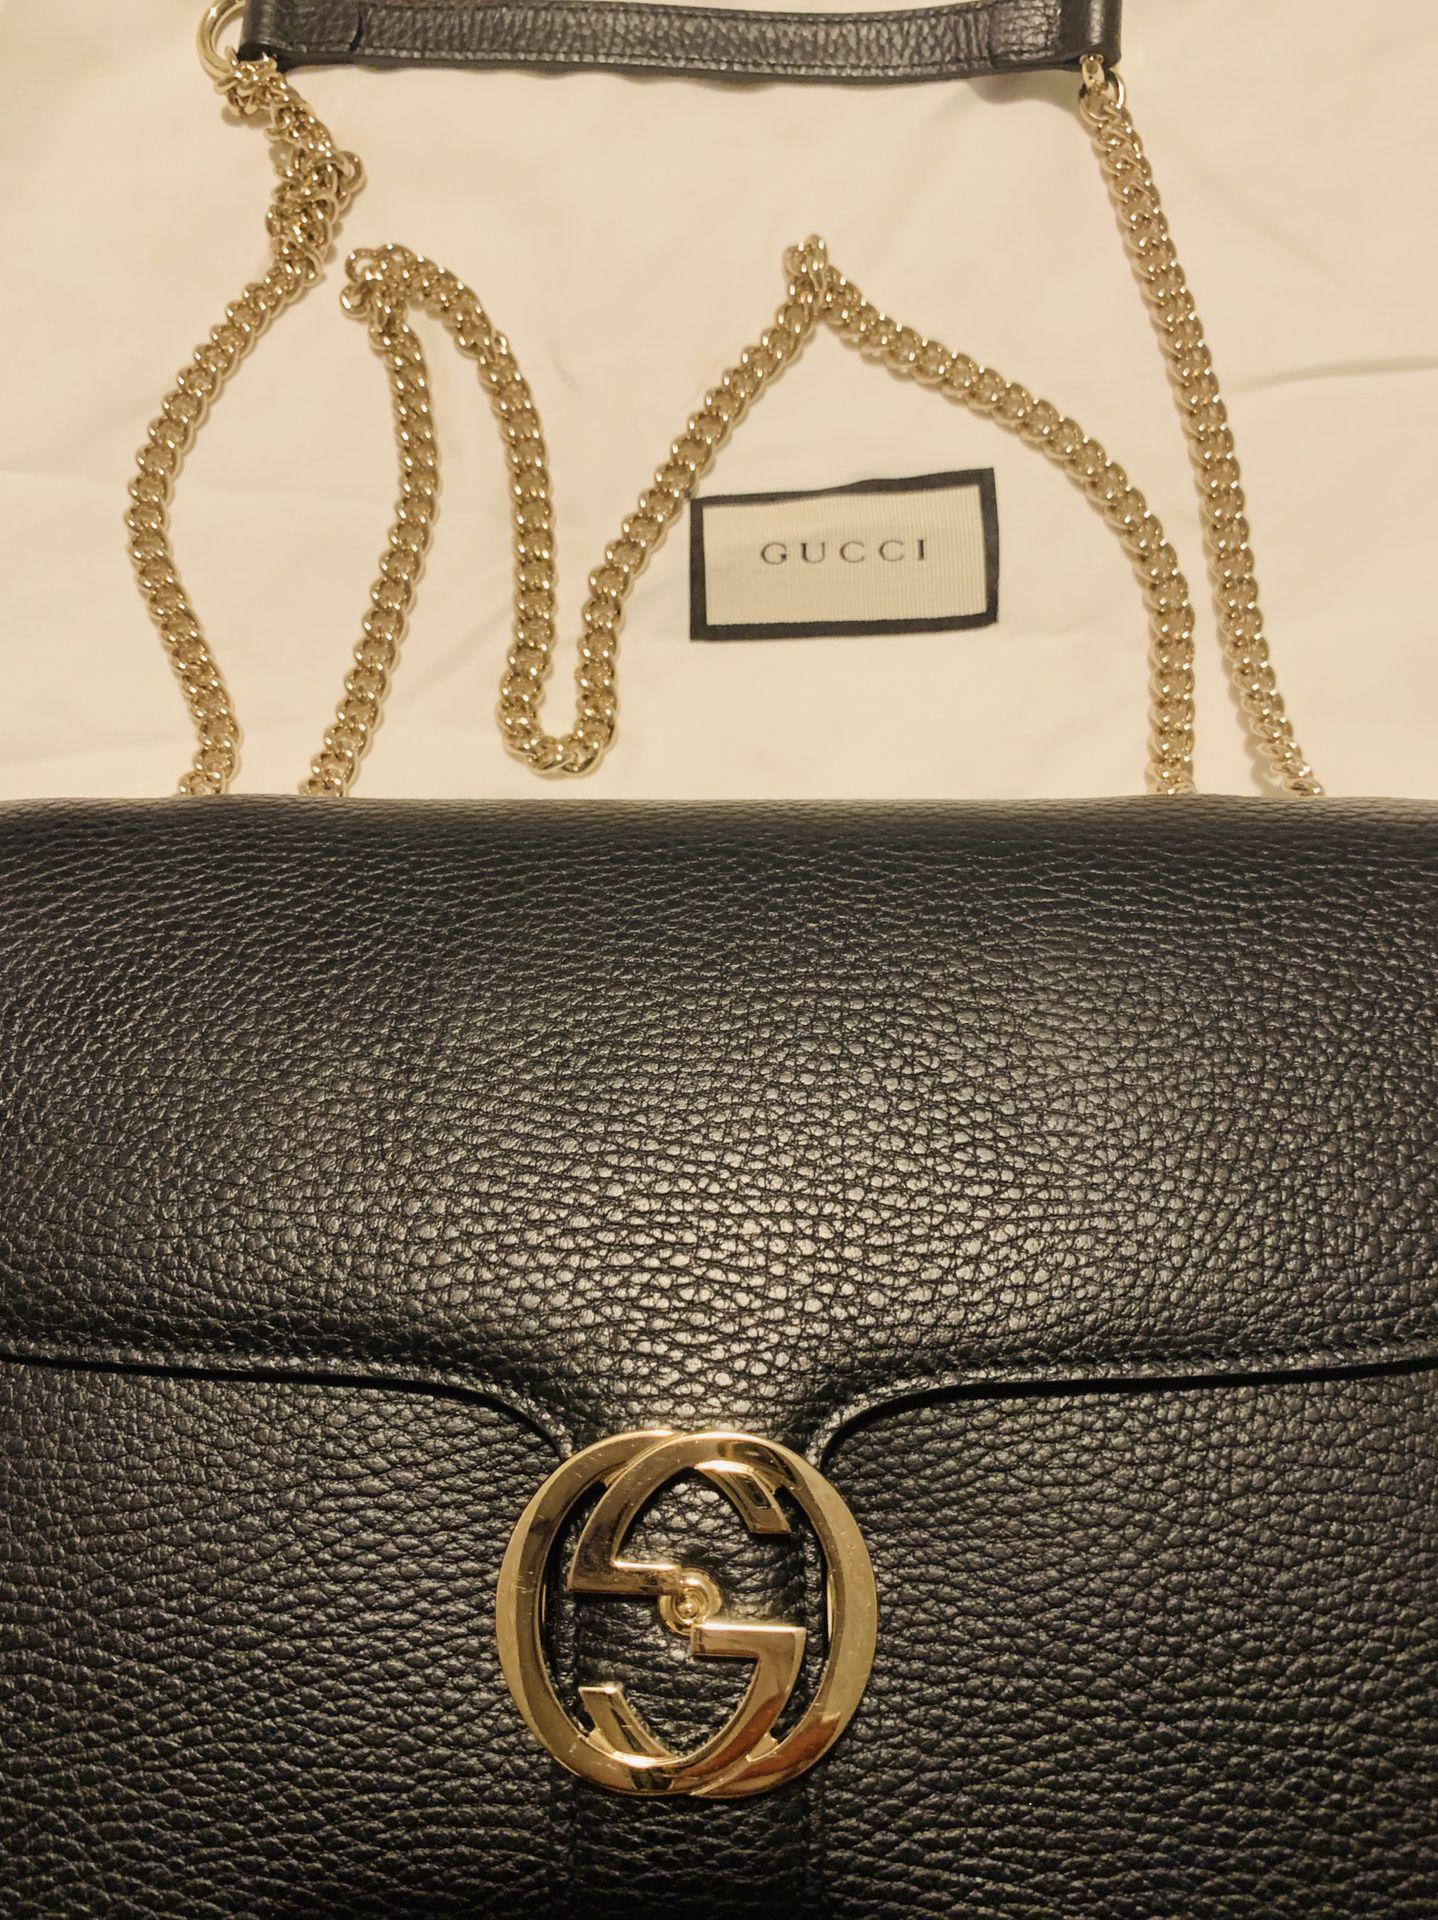 GUCCI Black Leather GG Interlocking Crossbody bag